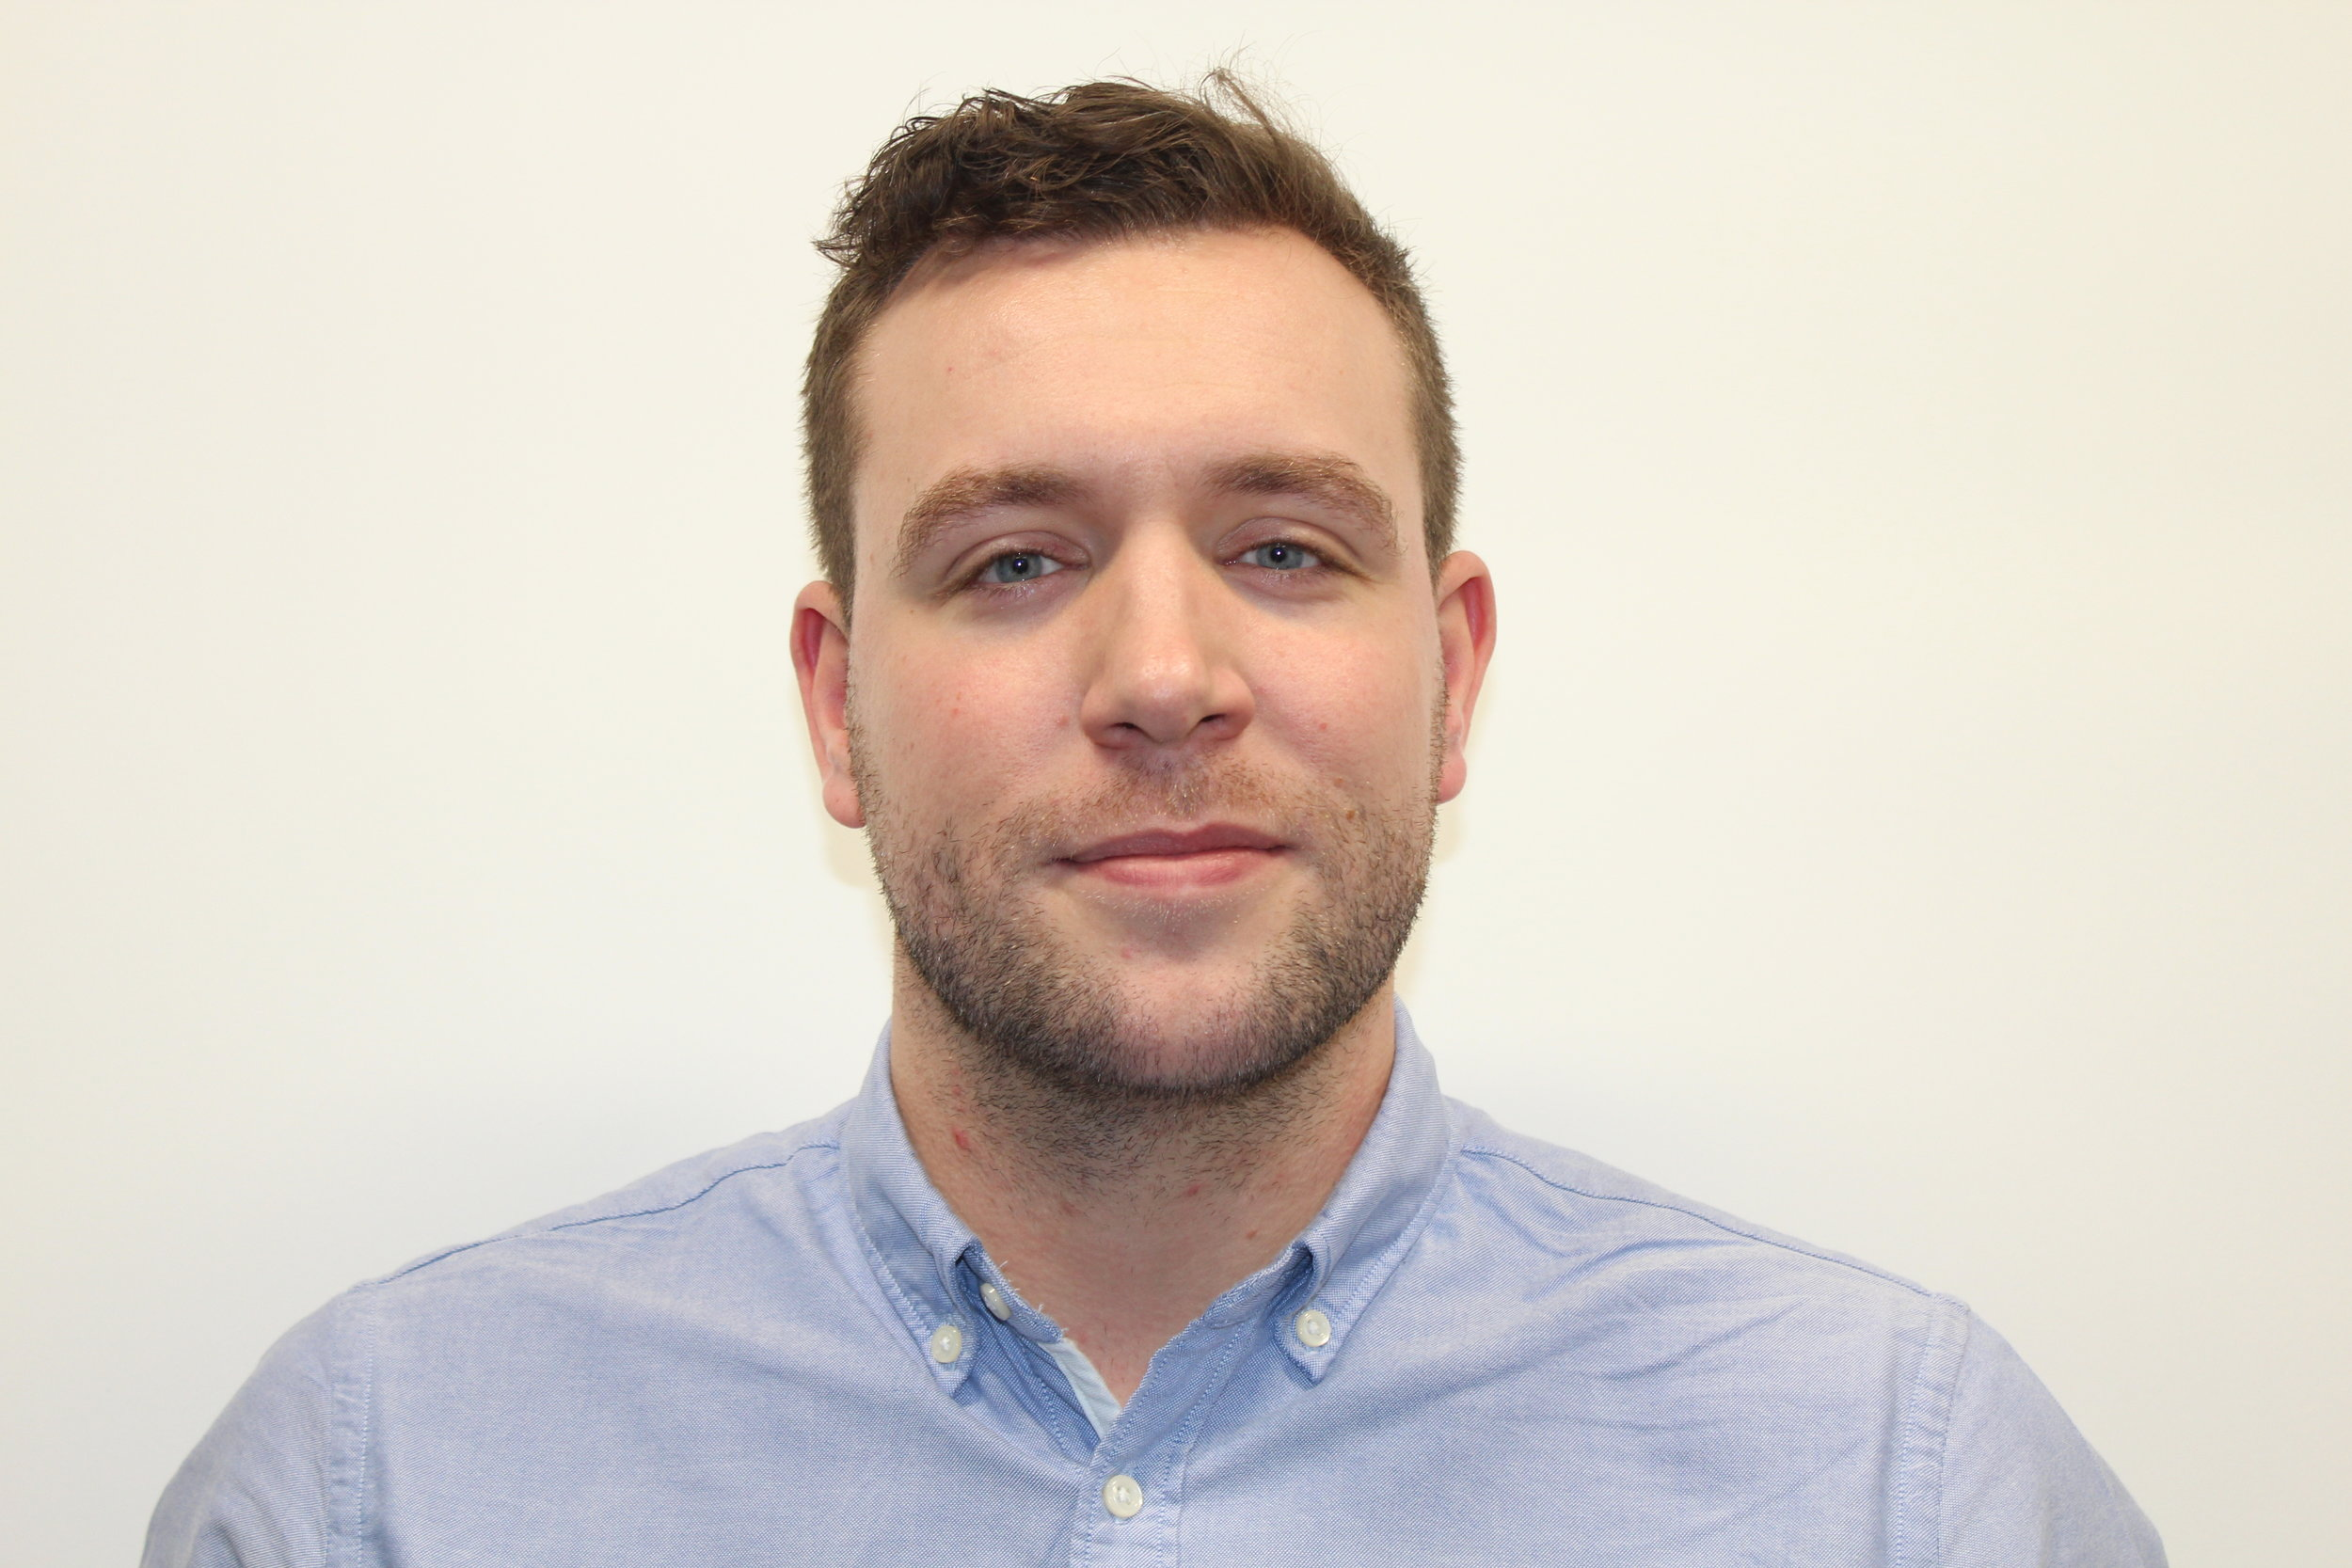 Kyle Probert - Co-Founder  \sdbgj'GAEJBPbik'atrn bfavkajerbvka;fdjadlbjats'  pbojksronl;wbjks'a;tok\ap  olkjOPElrb.